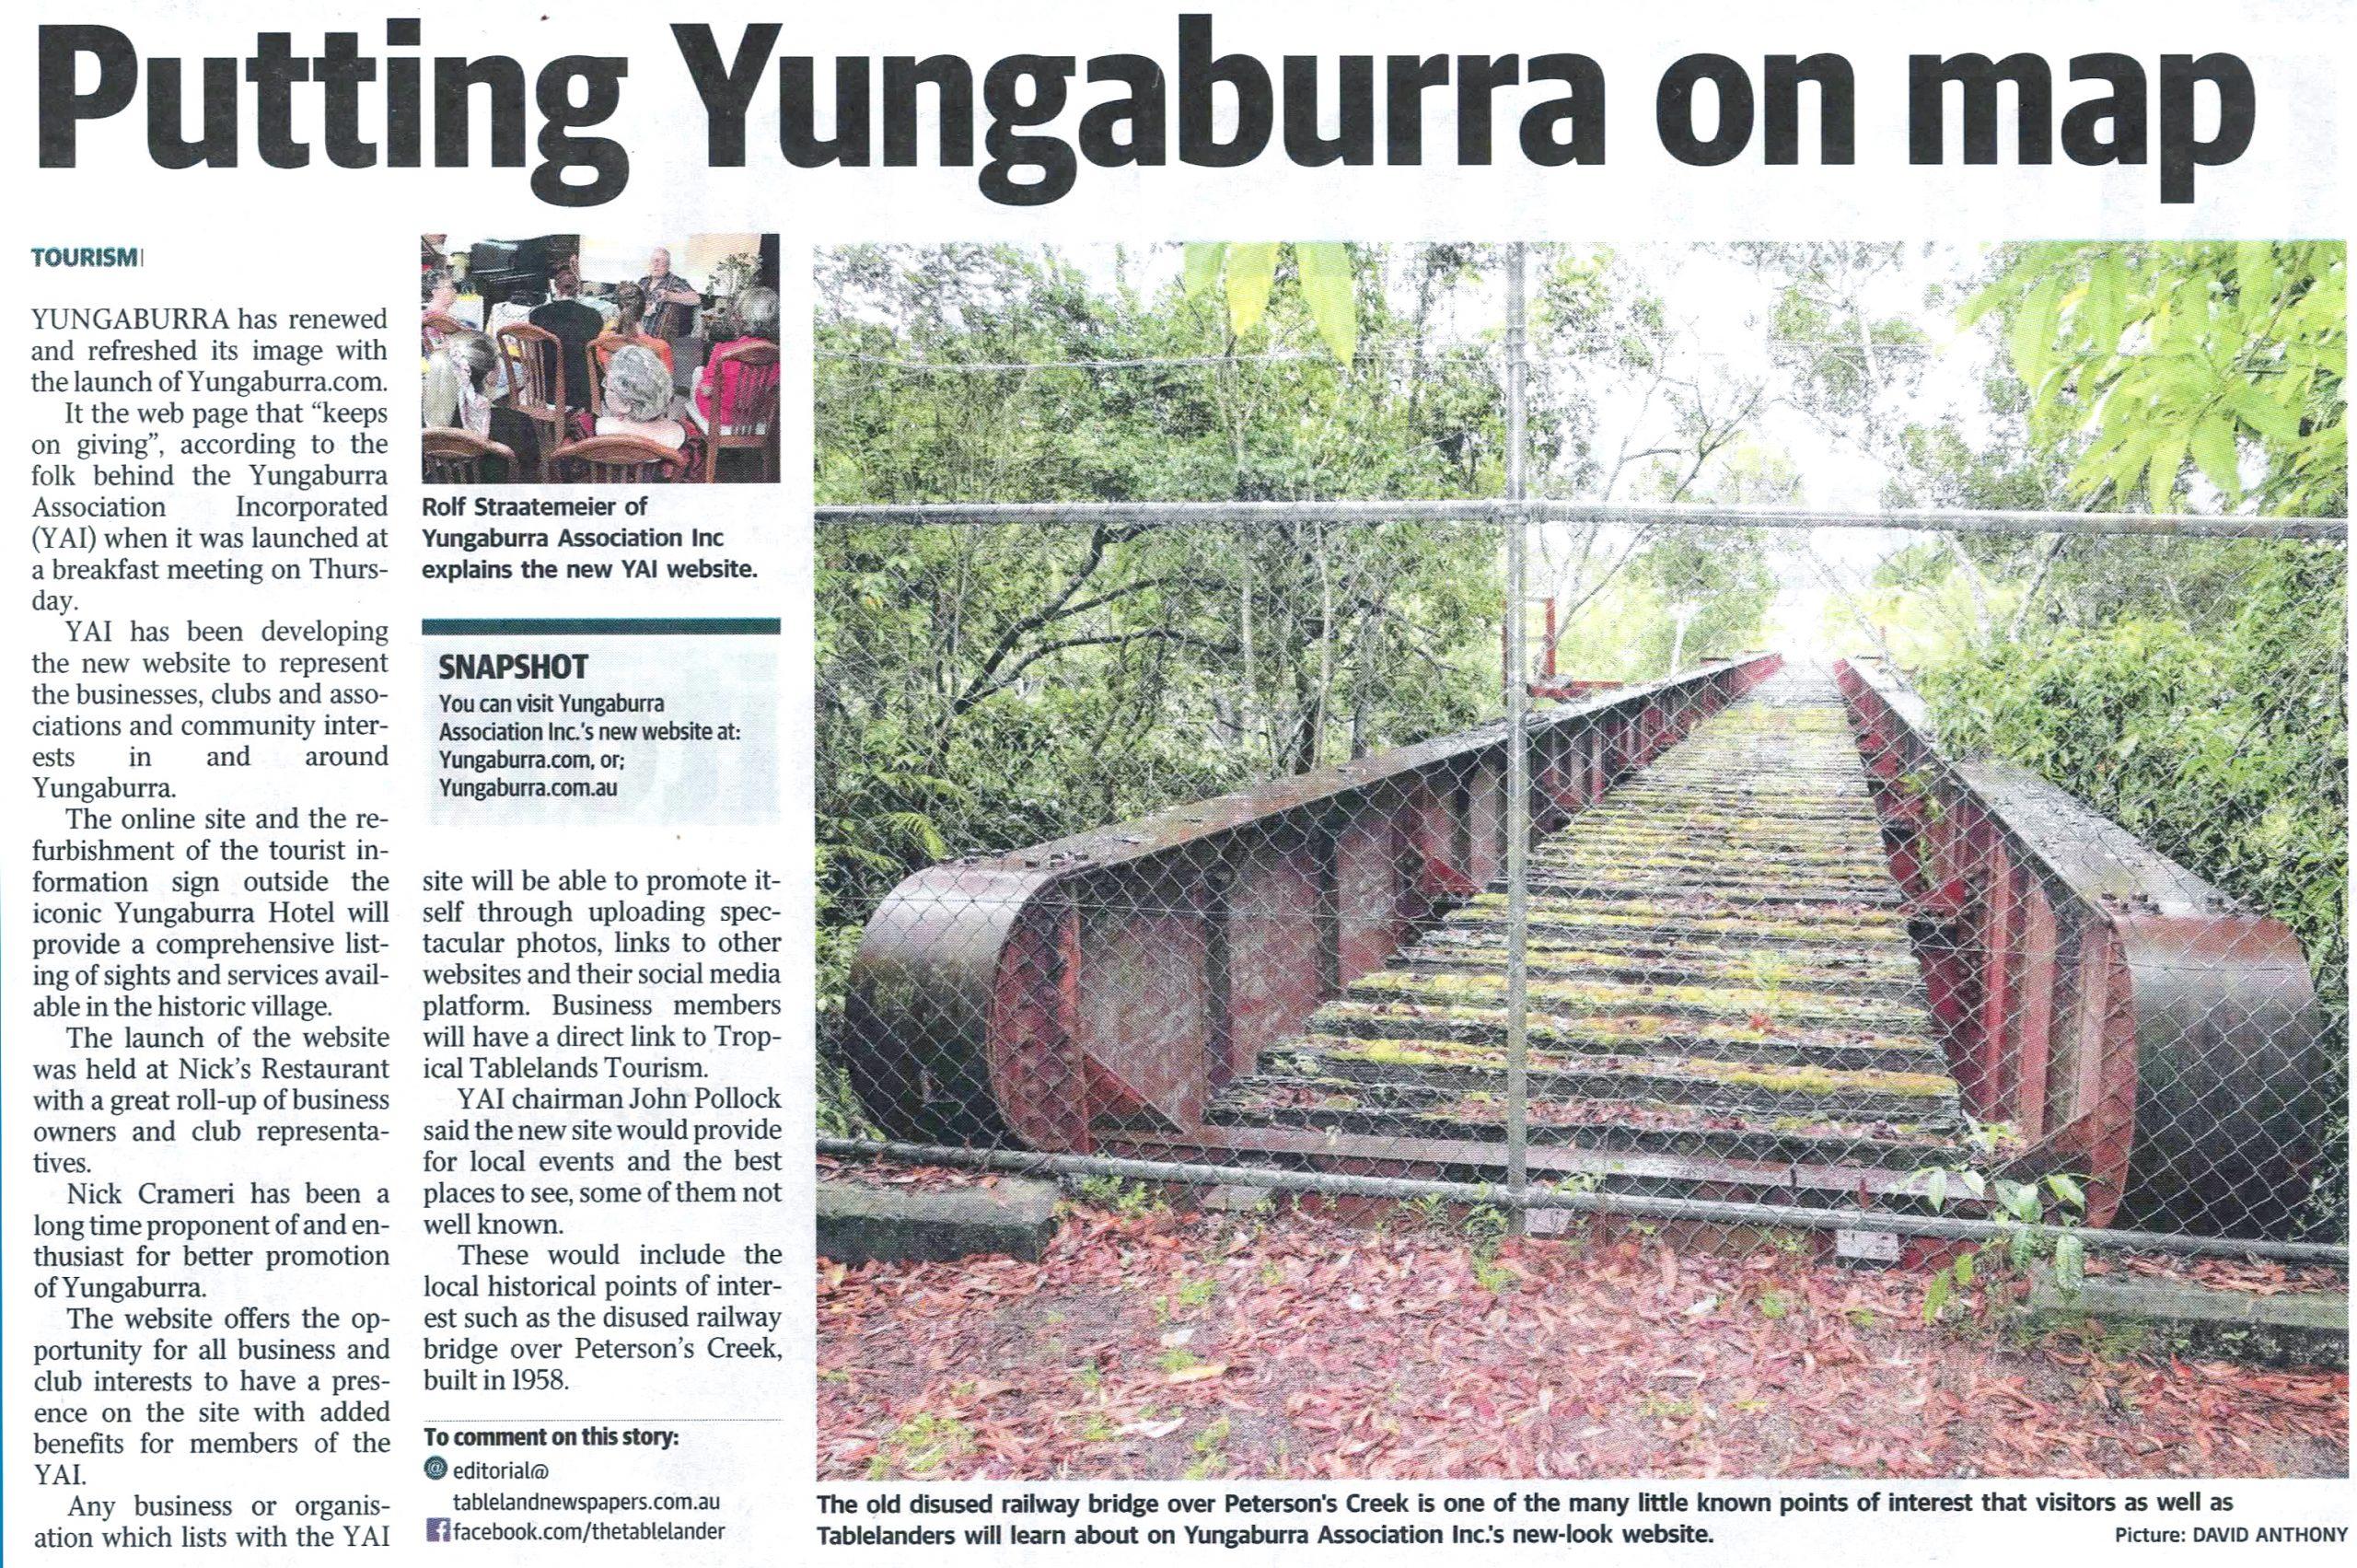 Yungaburra Association Website Launch in the Tablelander